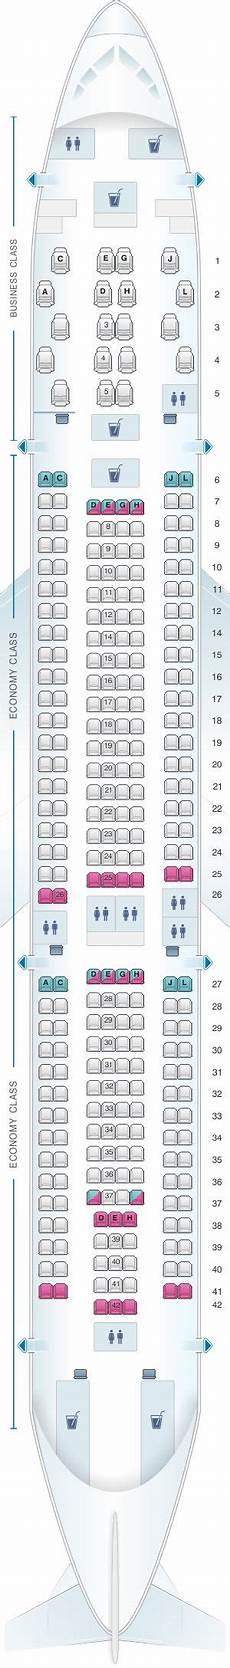 Iberia 2622 Seating Chart Seat Map Iberia Airbus A330 200 Jet Airways Plane Seats